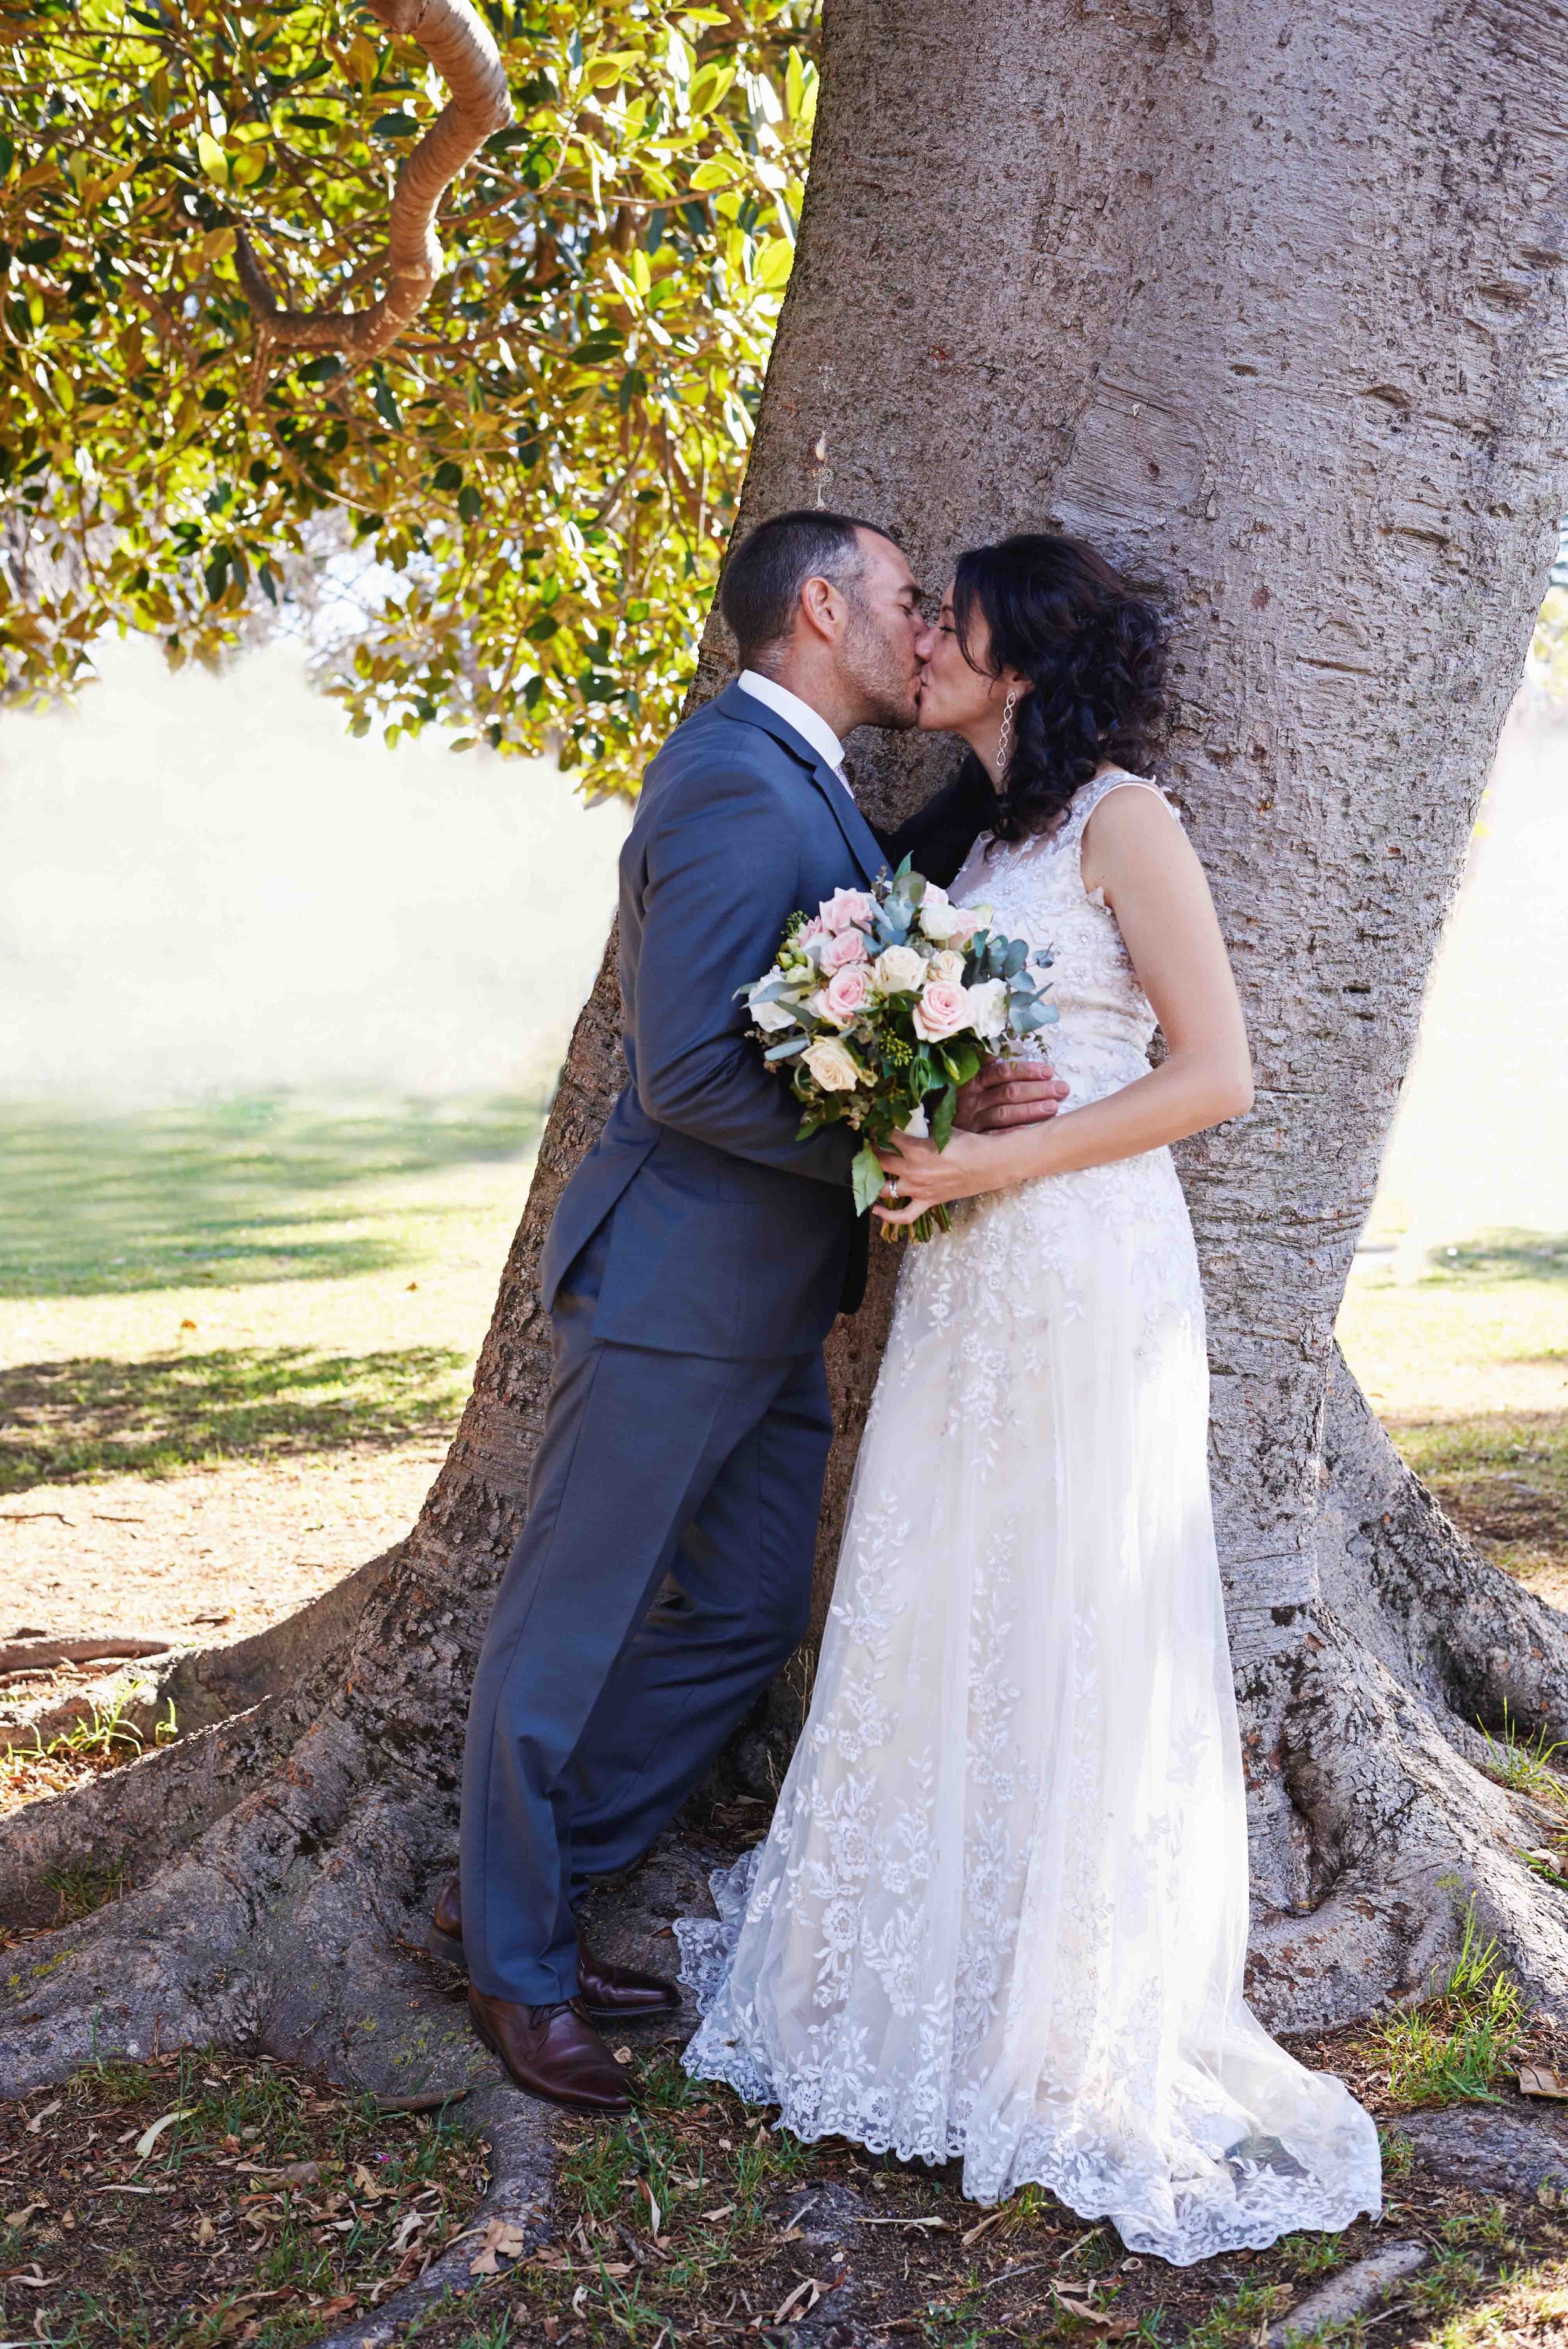 sorrento-wedding-photography-all-smiles-marissa-jade-photography-153.jpg